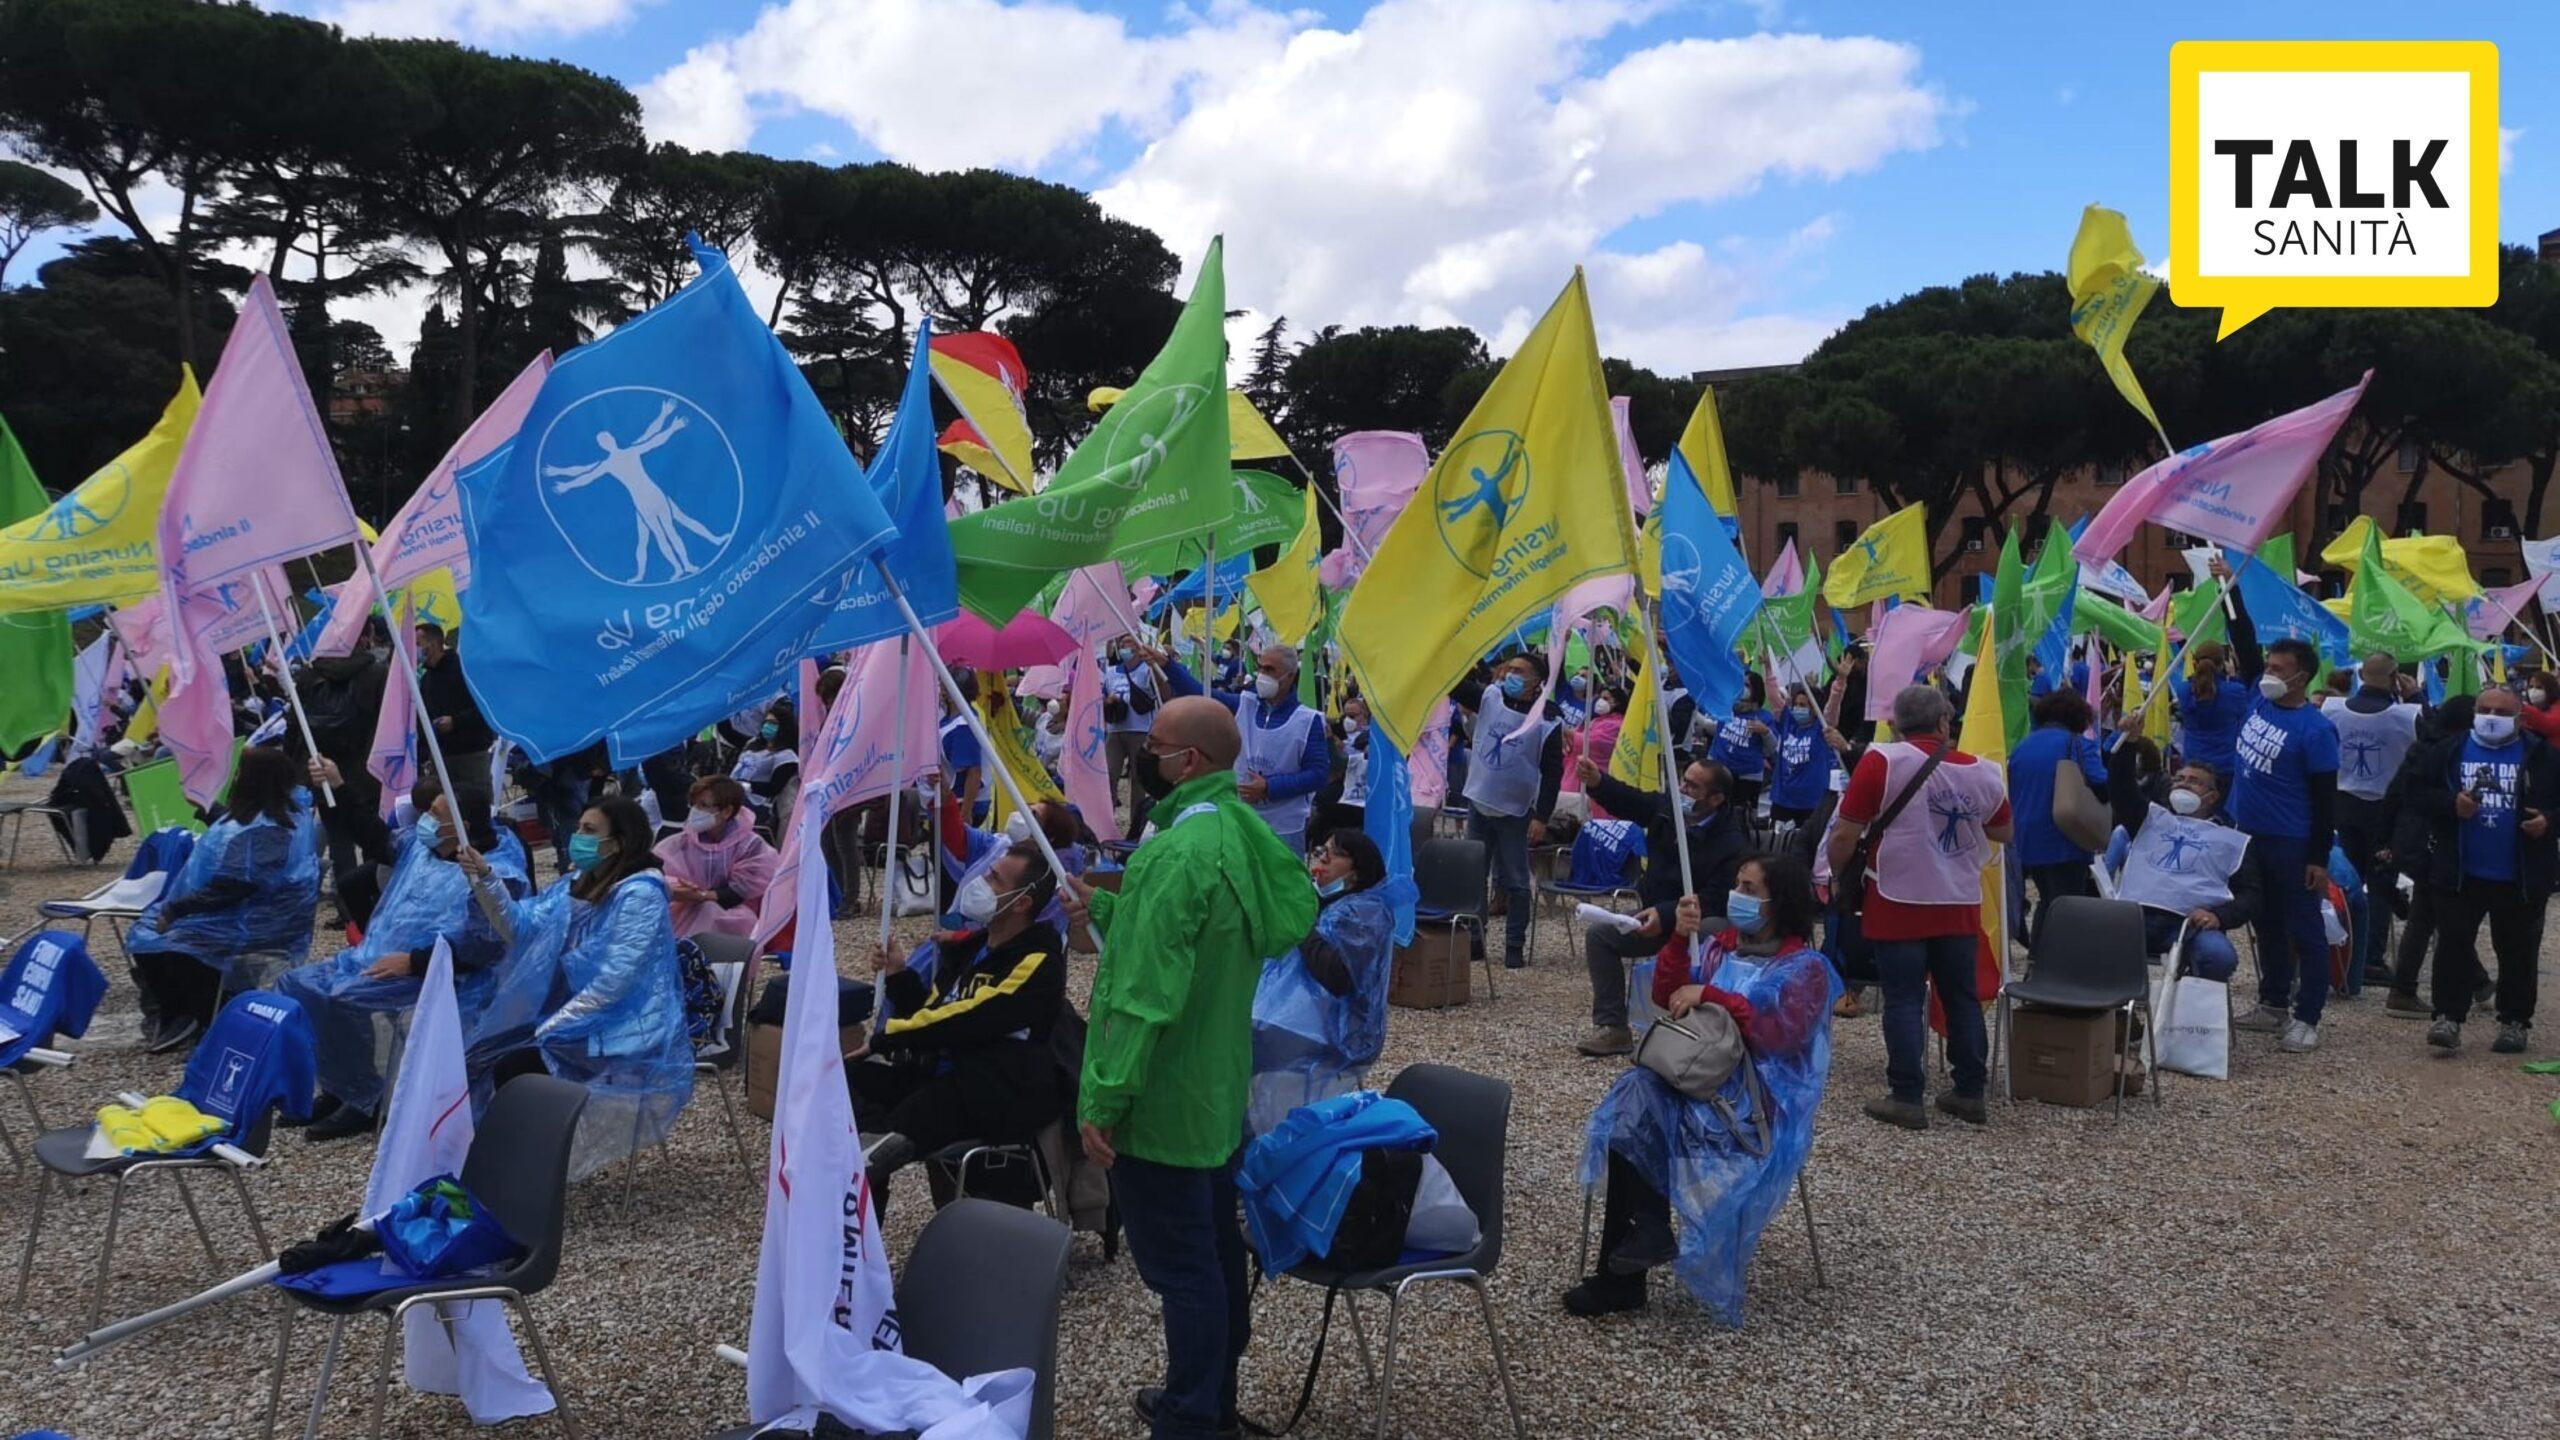 manifestazione degli infermieri NURSING UP